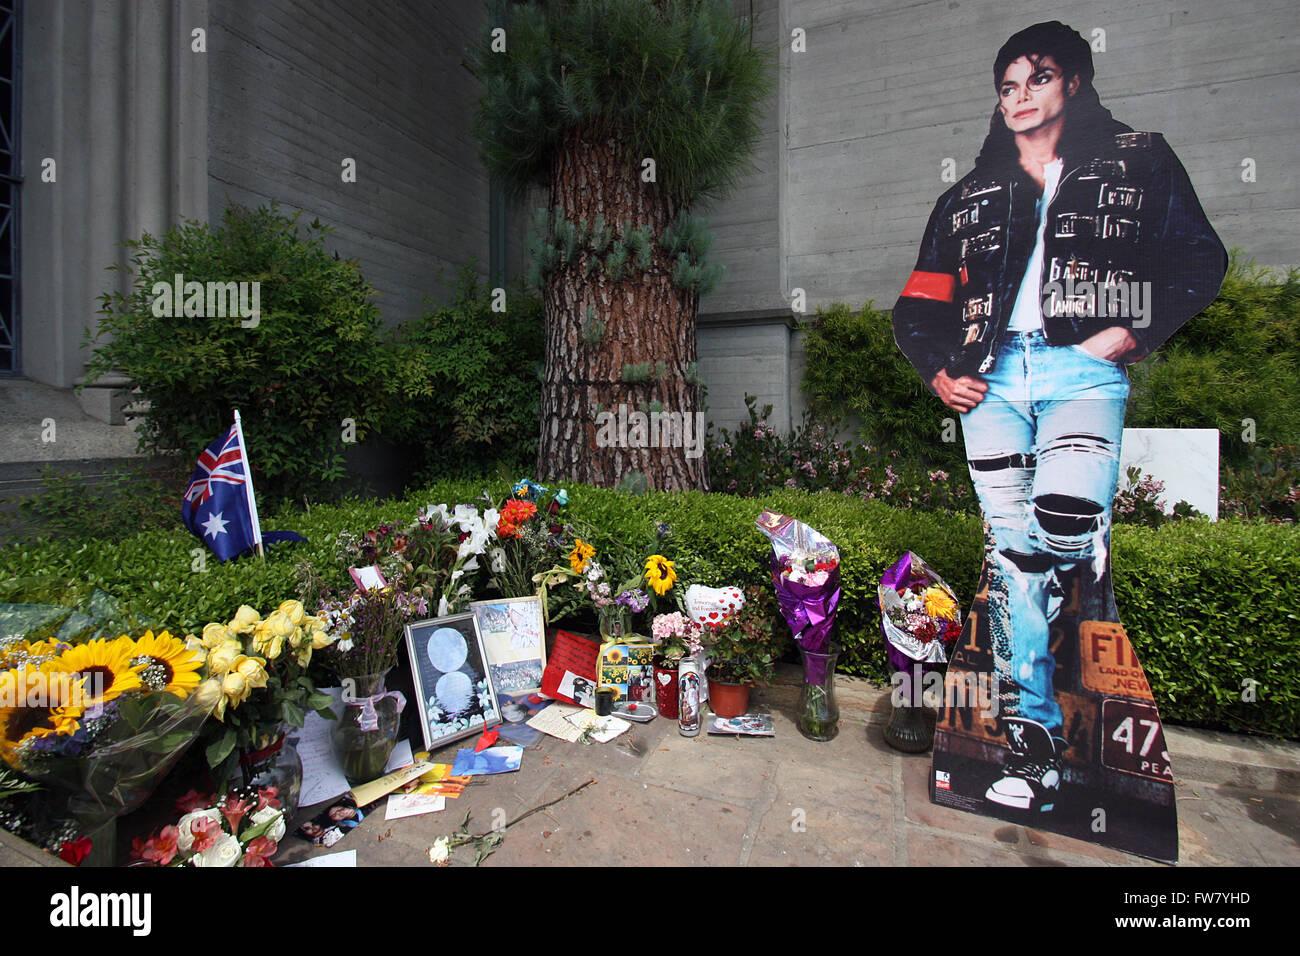 Download michael jackson images celebrity